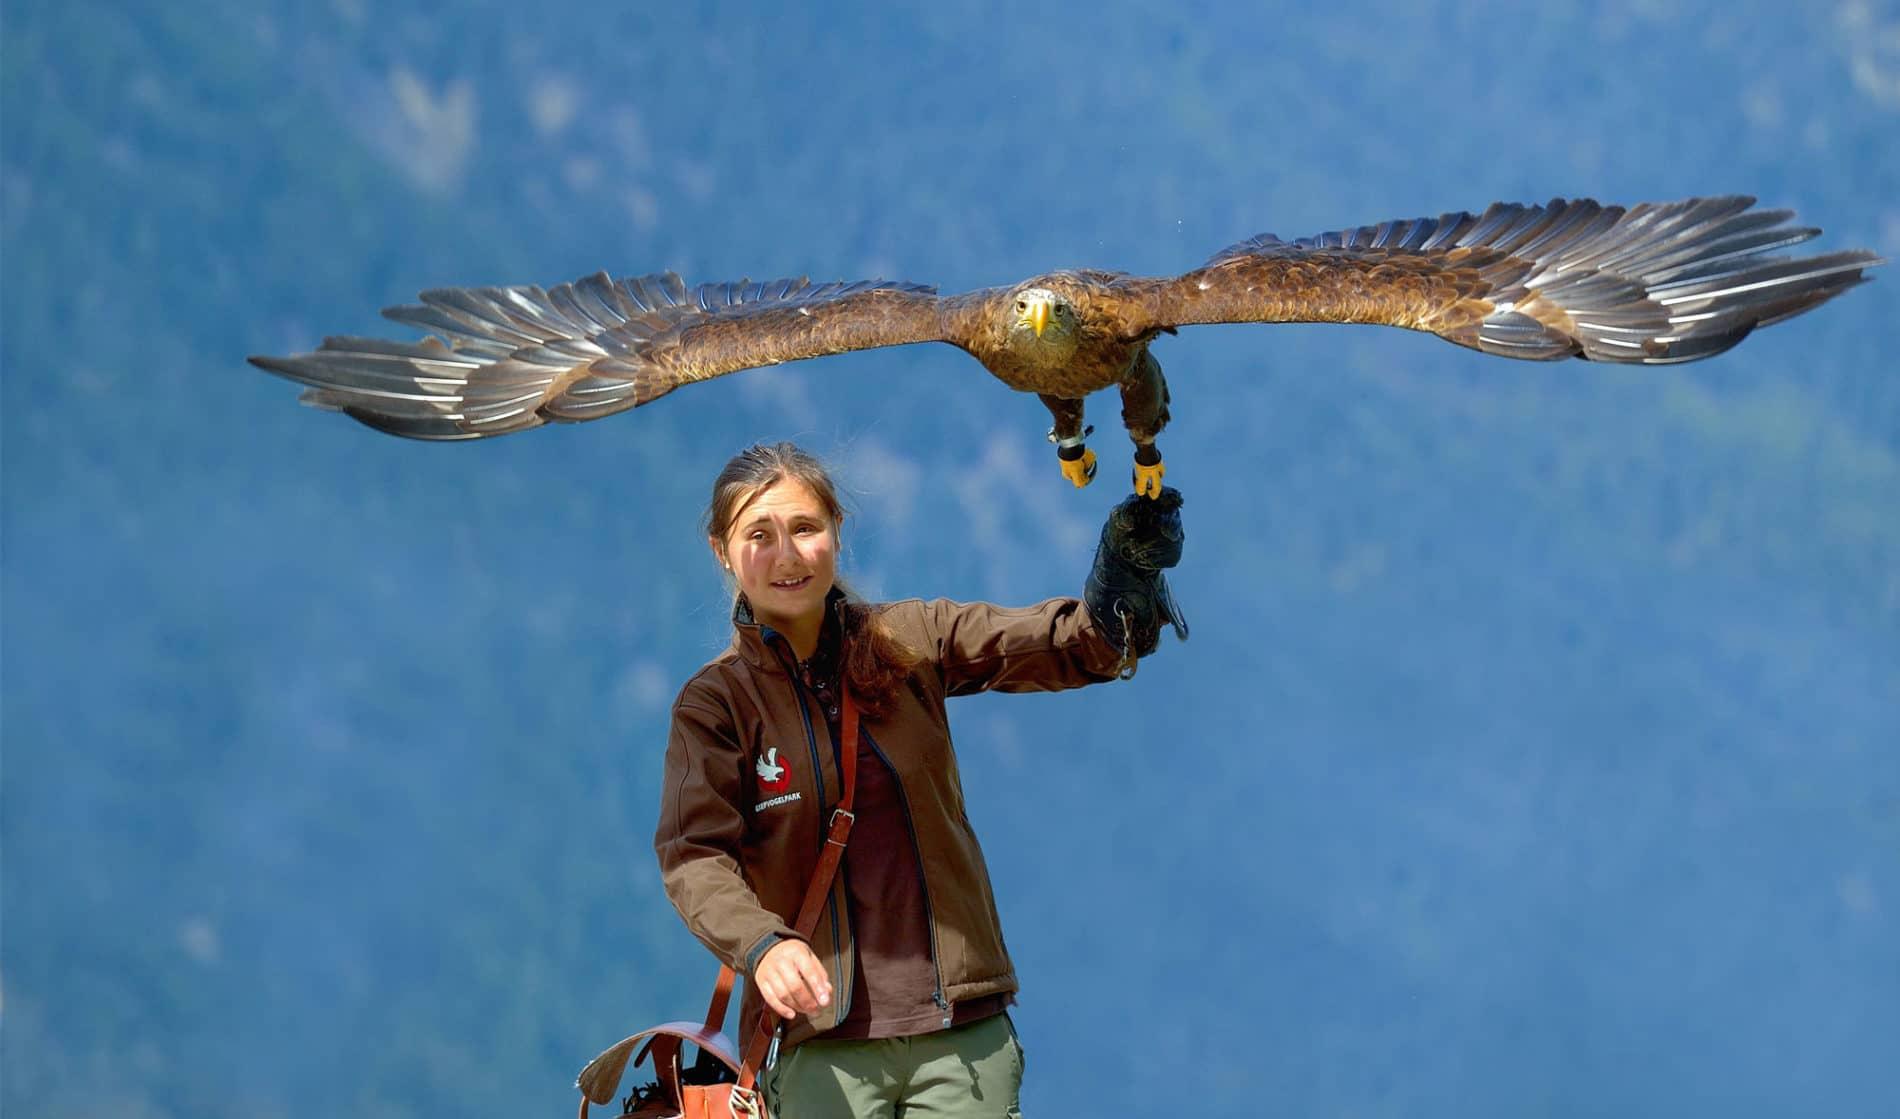 Falknerin mit Adler